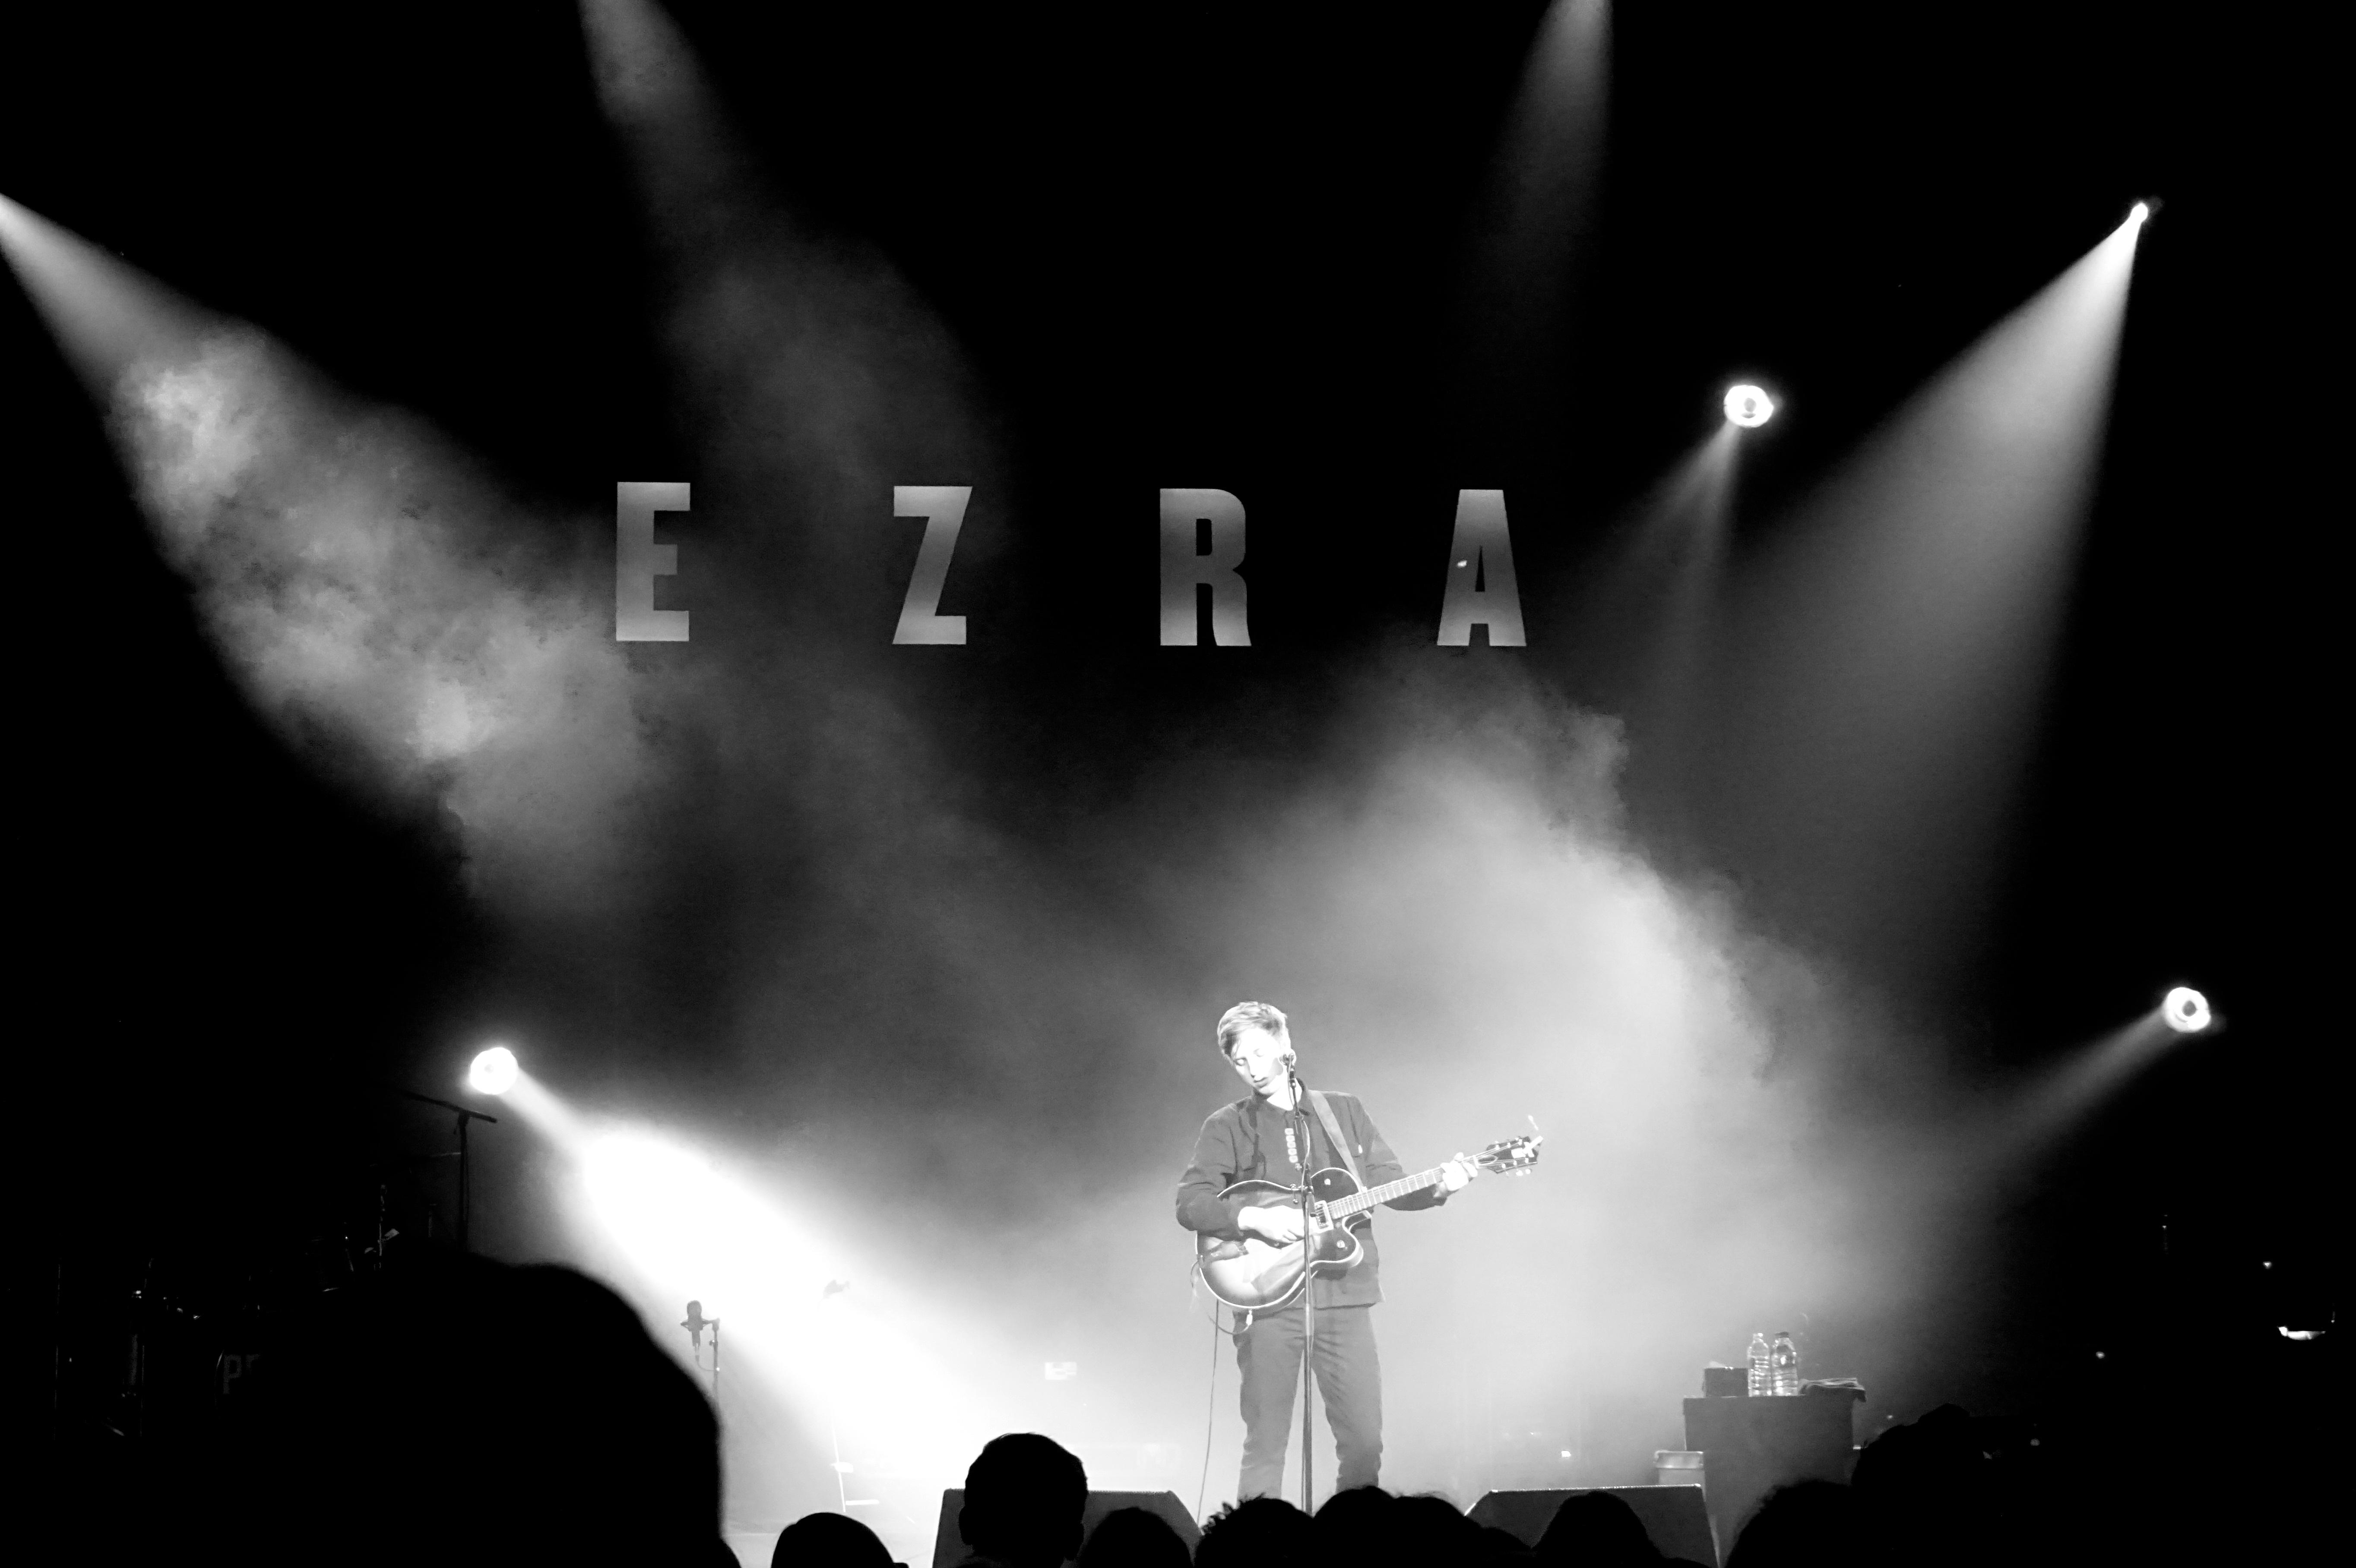 George Ezra Feb 3